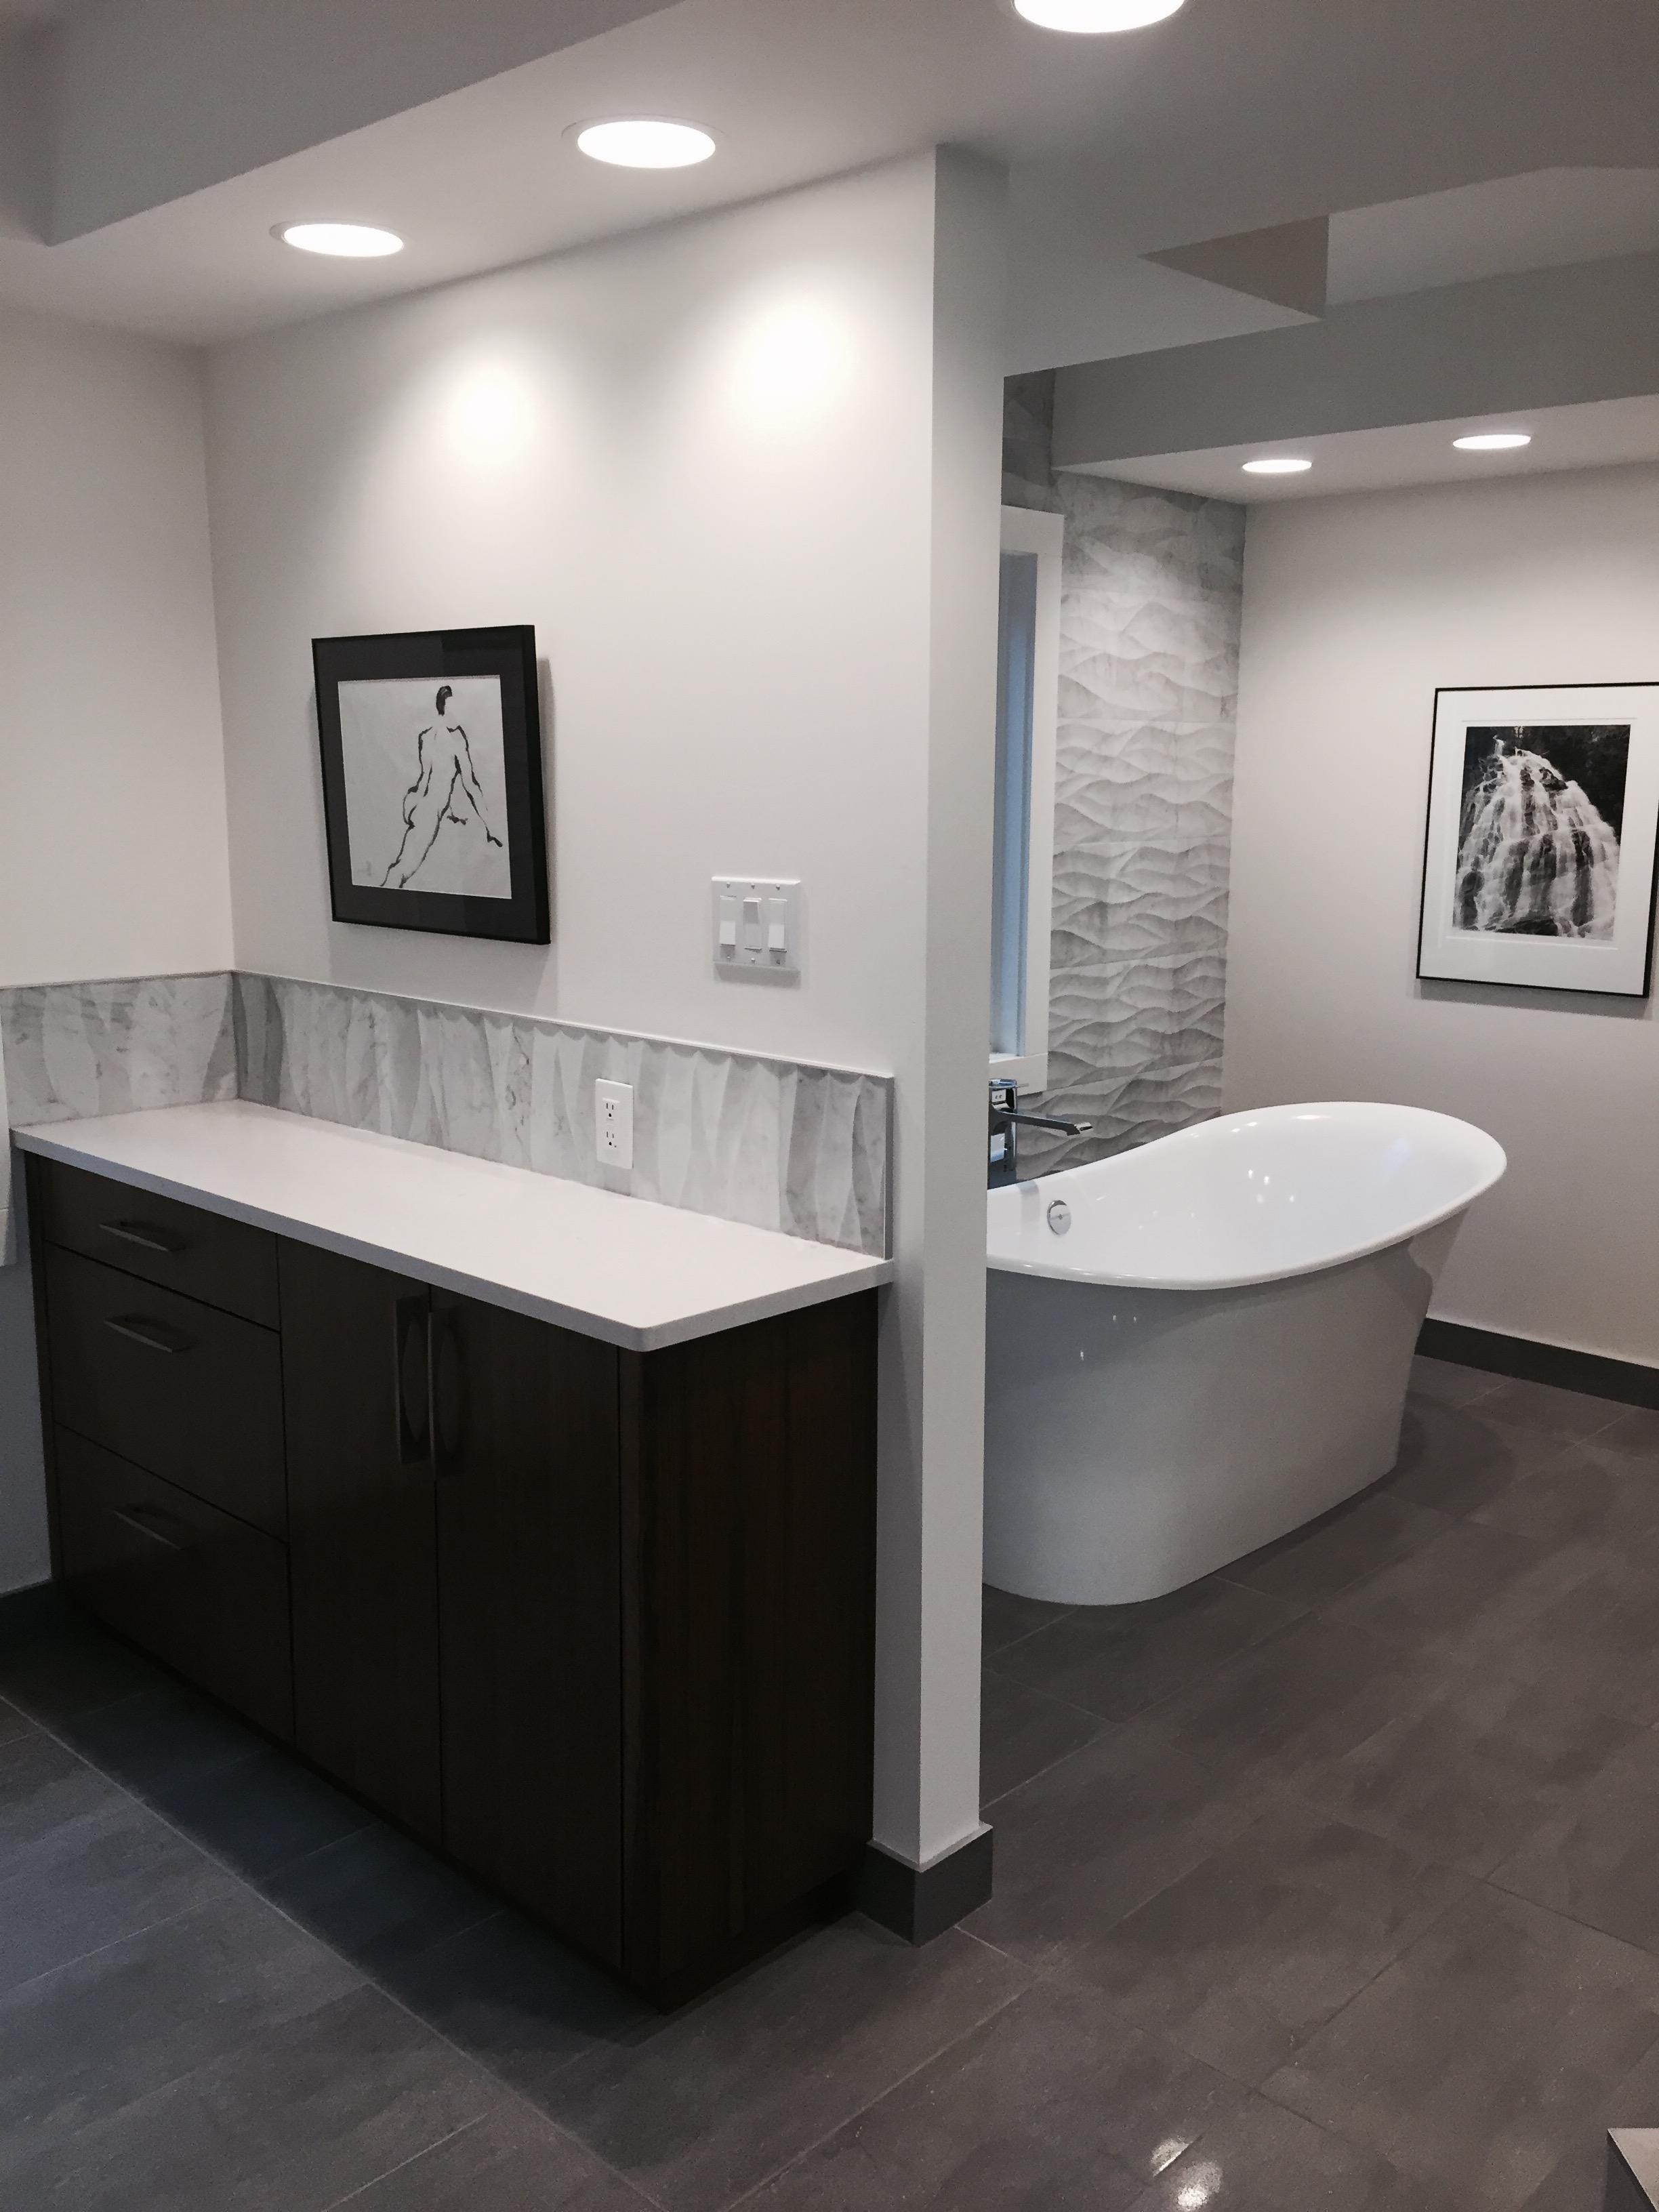 Custom walnut cabinetry, quartz countertops, volcanic limestone bathtub, bianca carrara tile.